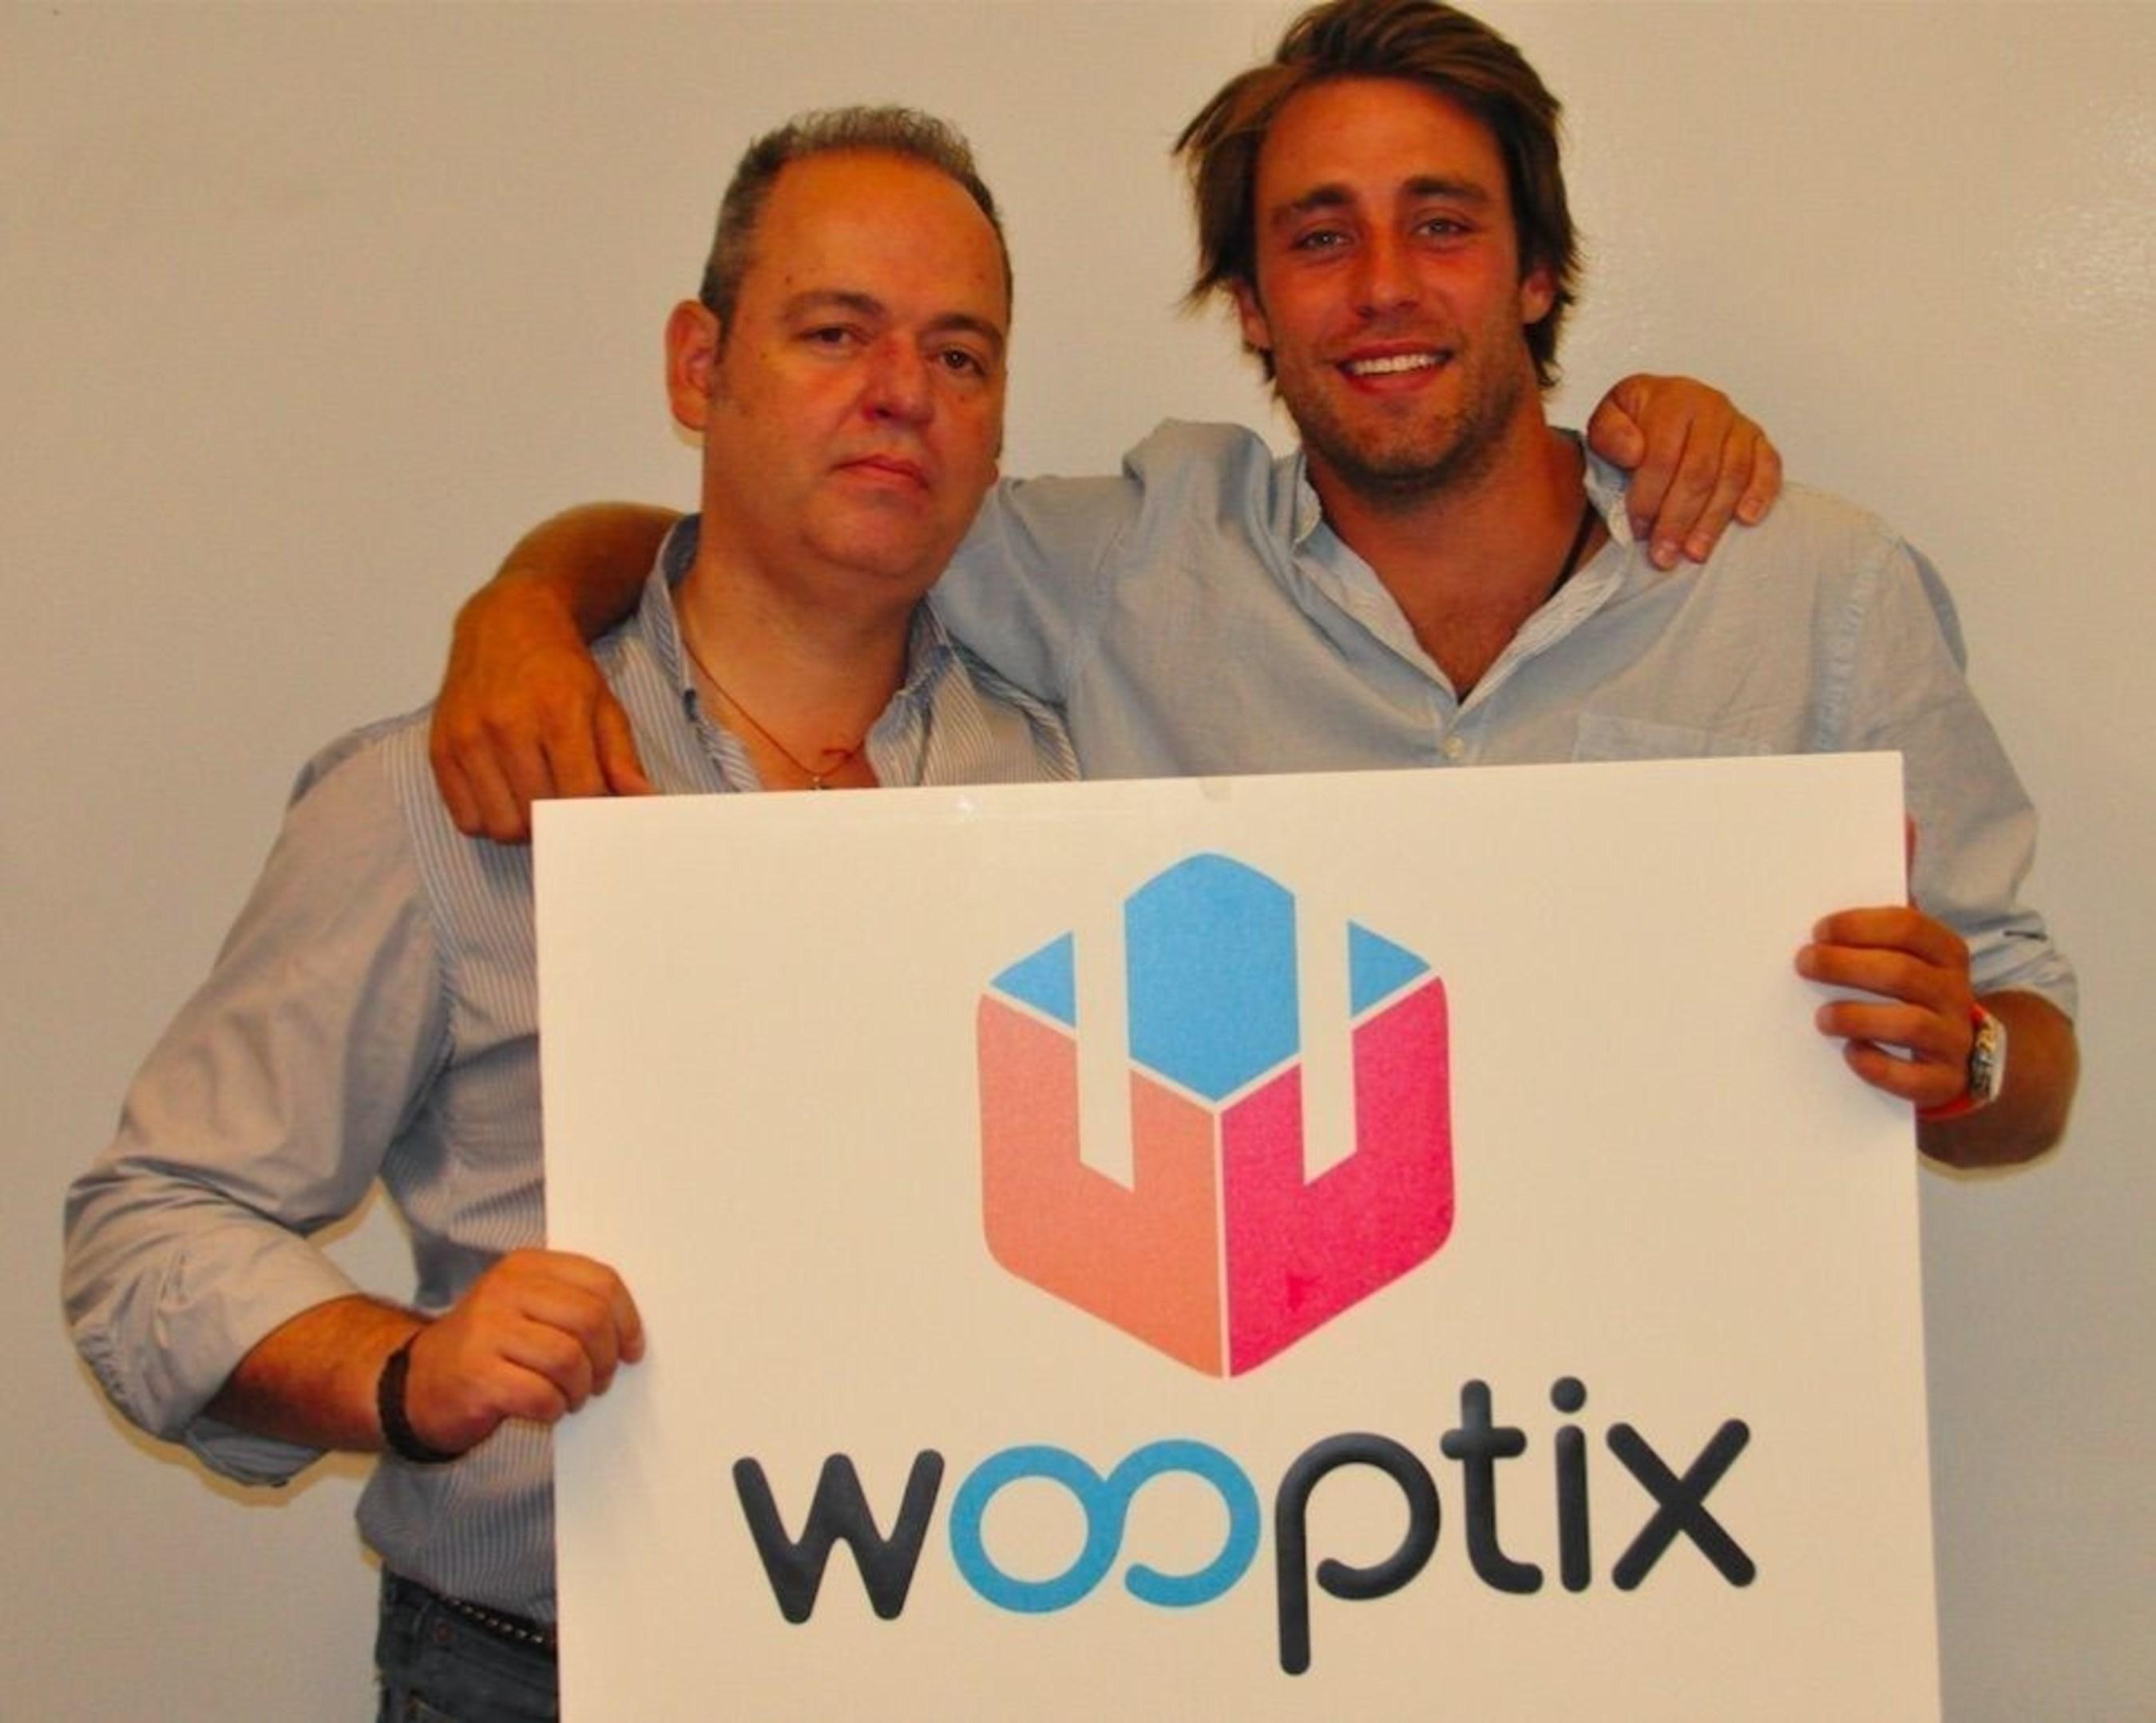 Cofounders Javier Parraga (left) and Javier Elizalde (right)